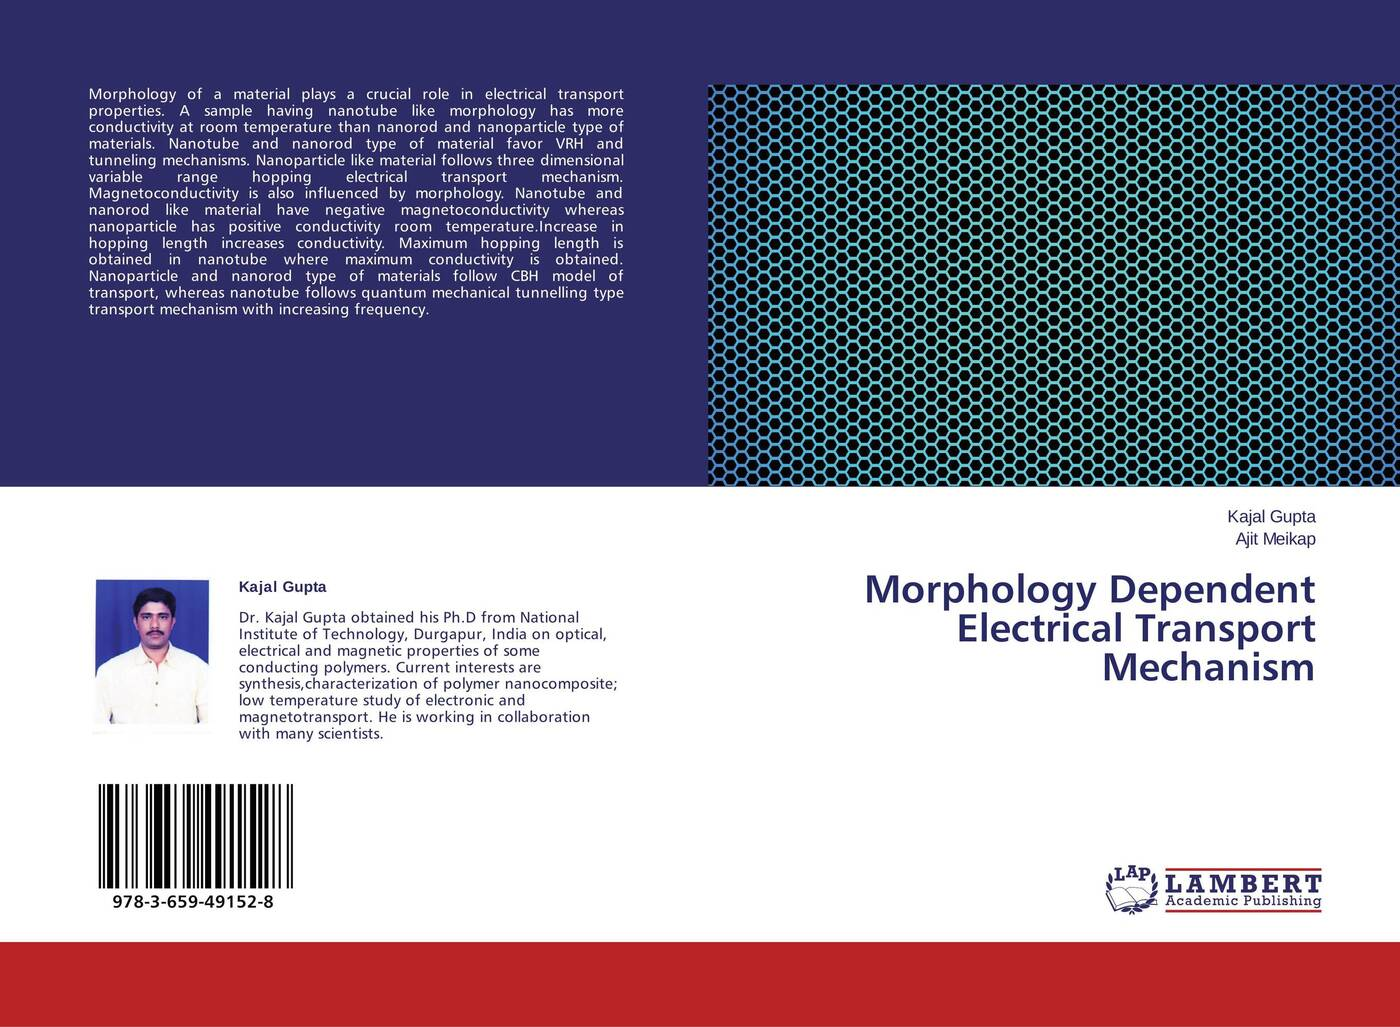 Kajal Gupta and Ajit Meikap Morphology Dependent Electrical Transport Mechanism 24 type b10k potentiometer handle length 15mmx6 3mm